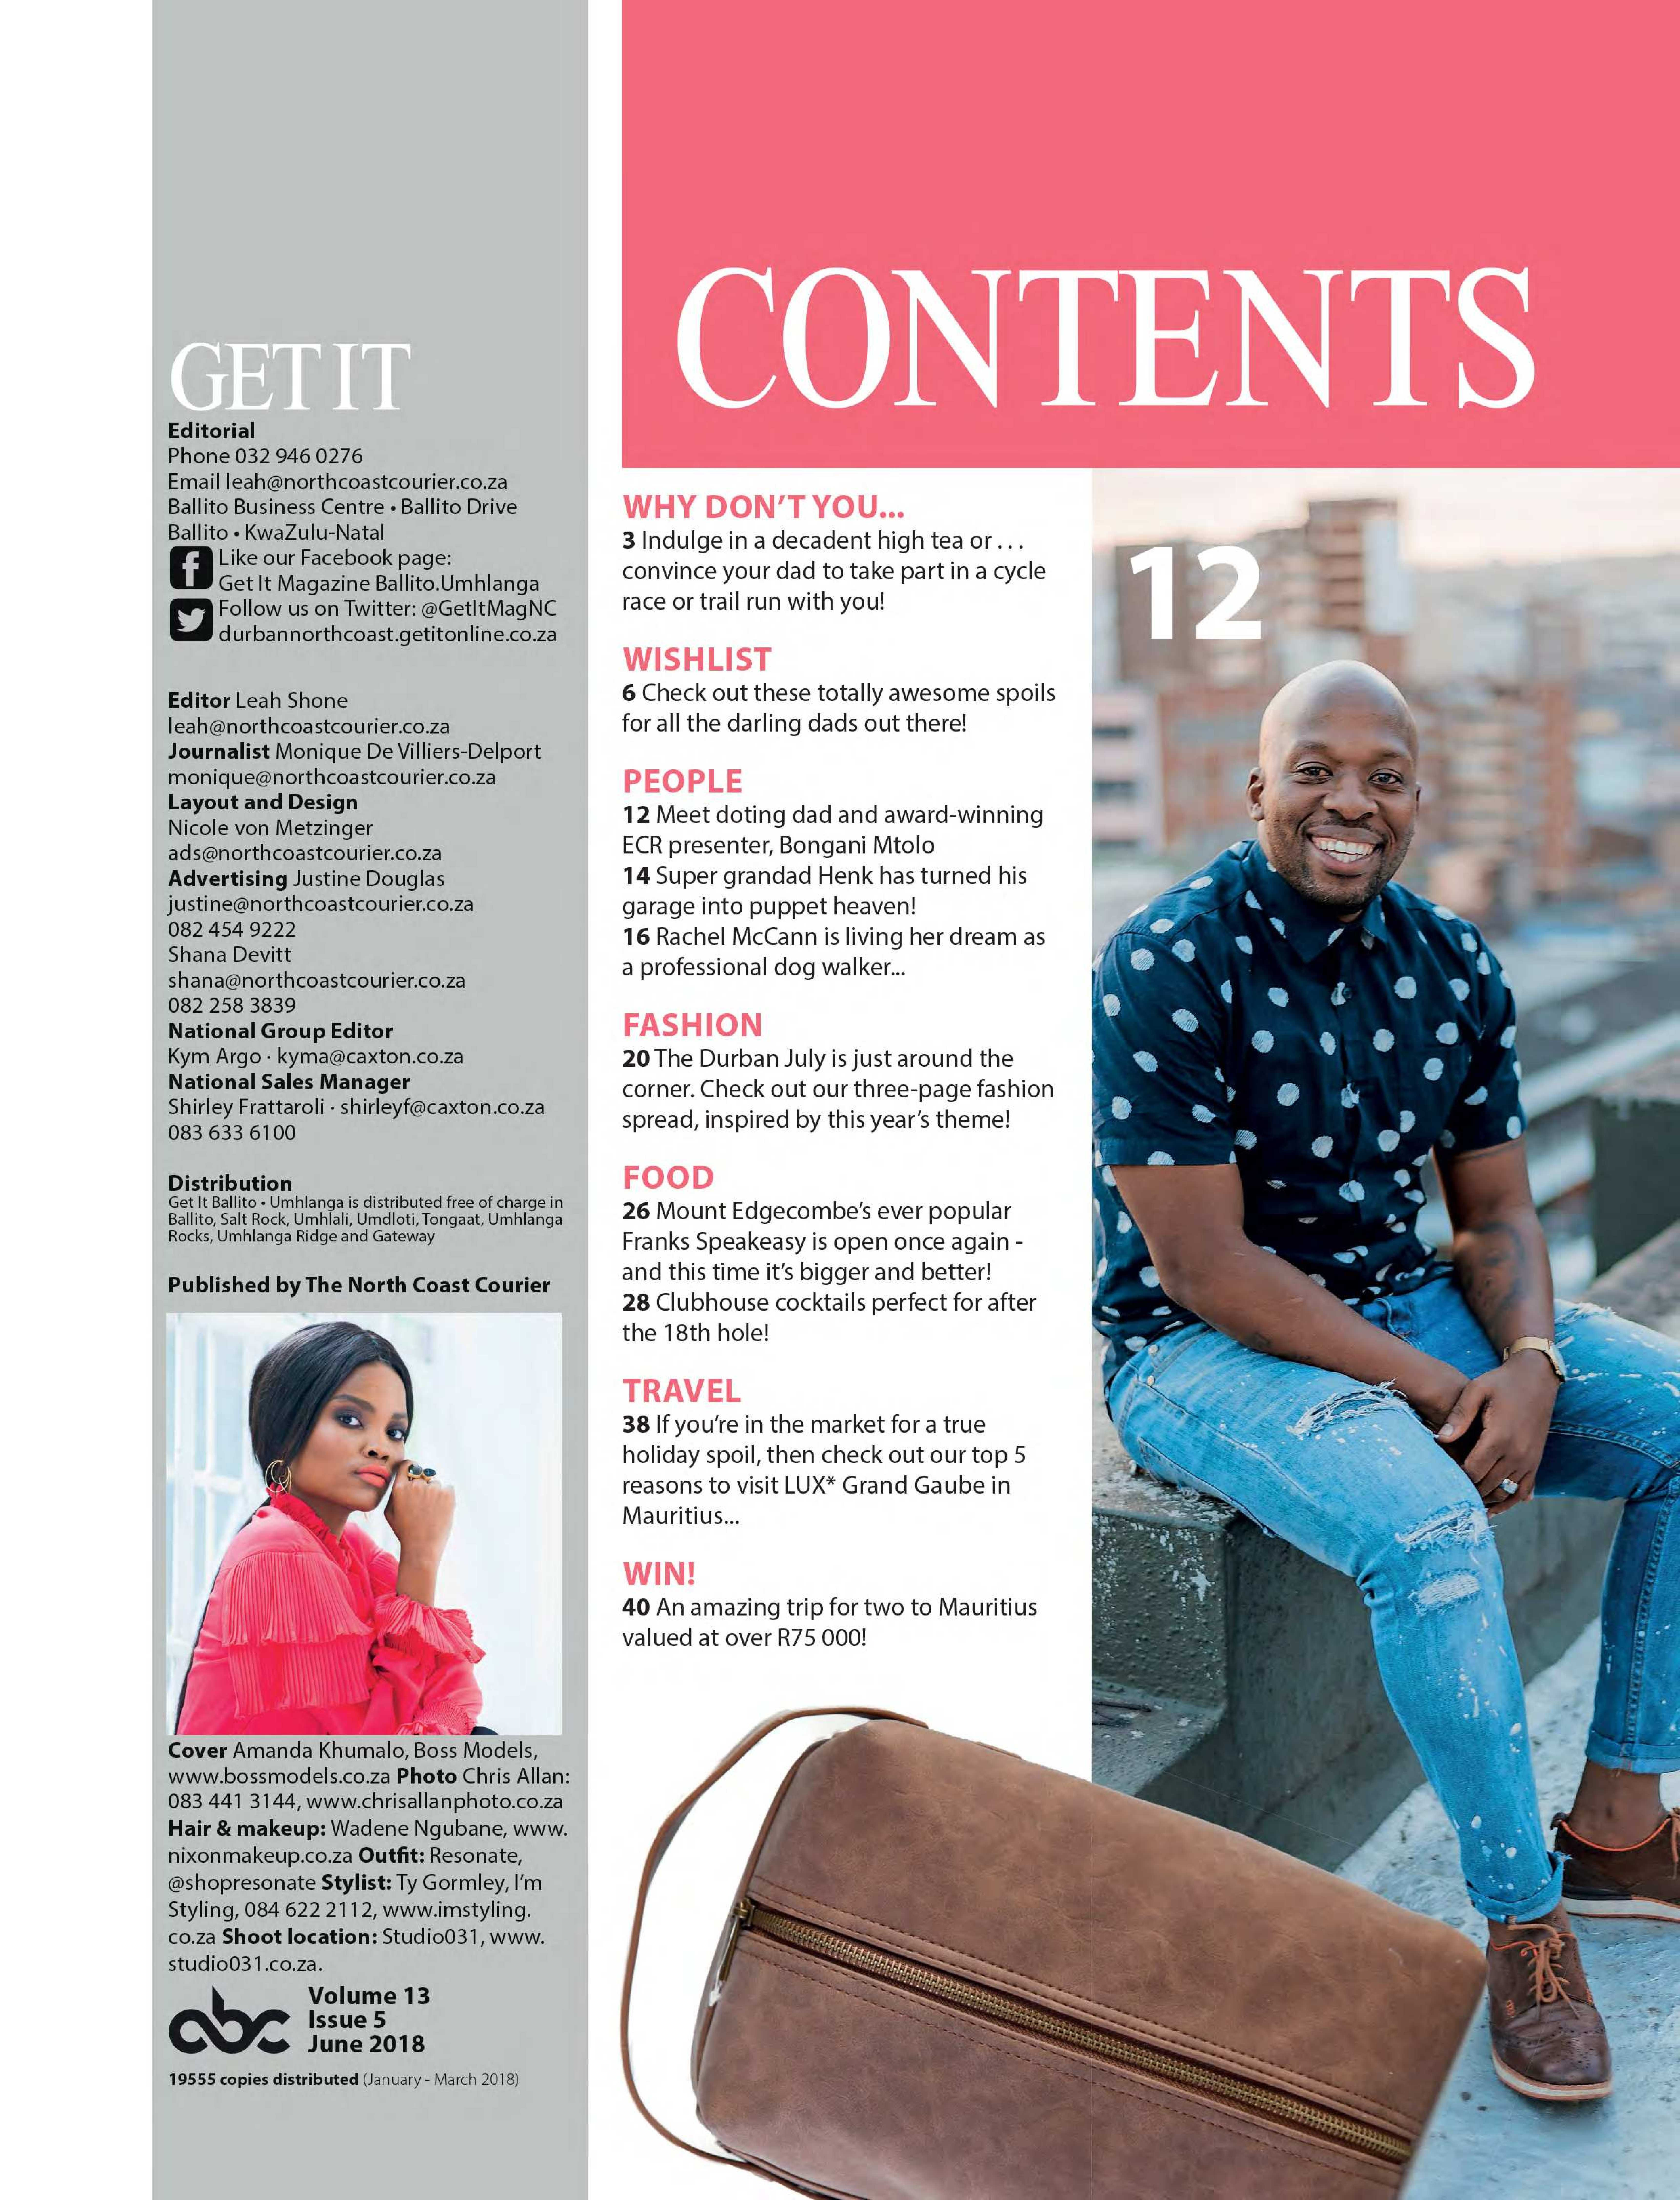 Get It Magazine (Ballito/Umhlanga) June 2018 | Get It Ballito Umhlanga